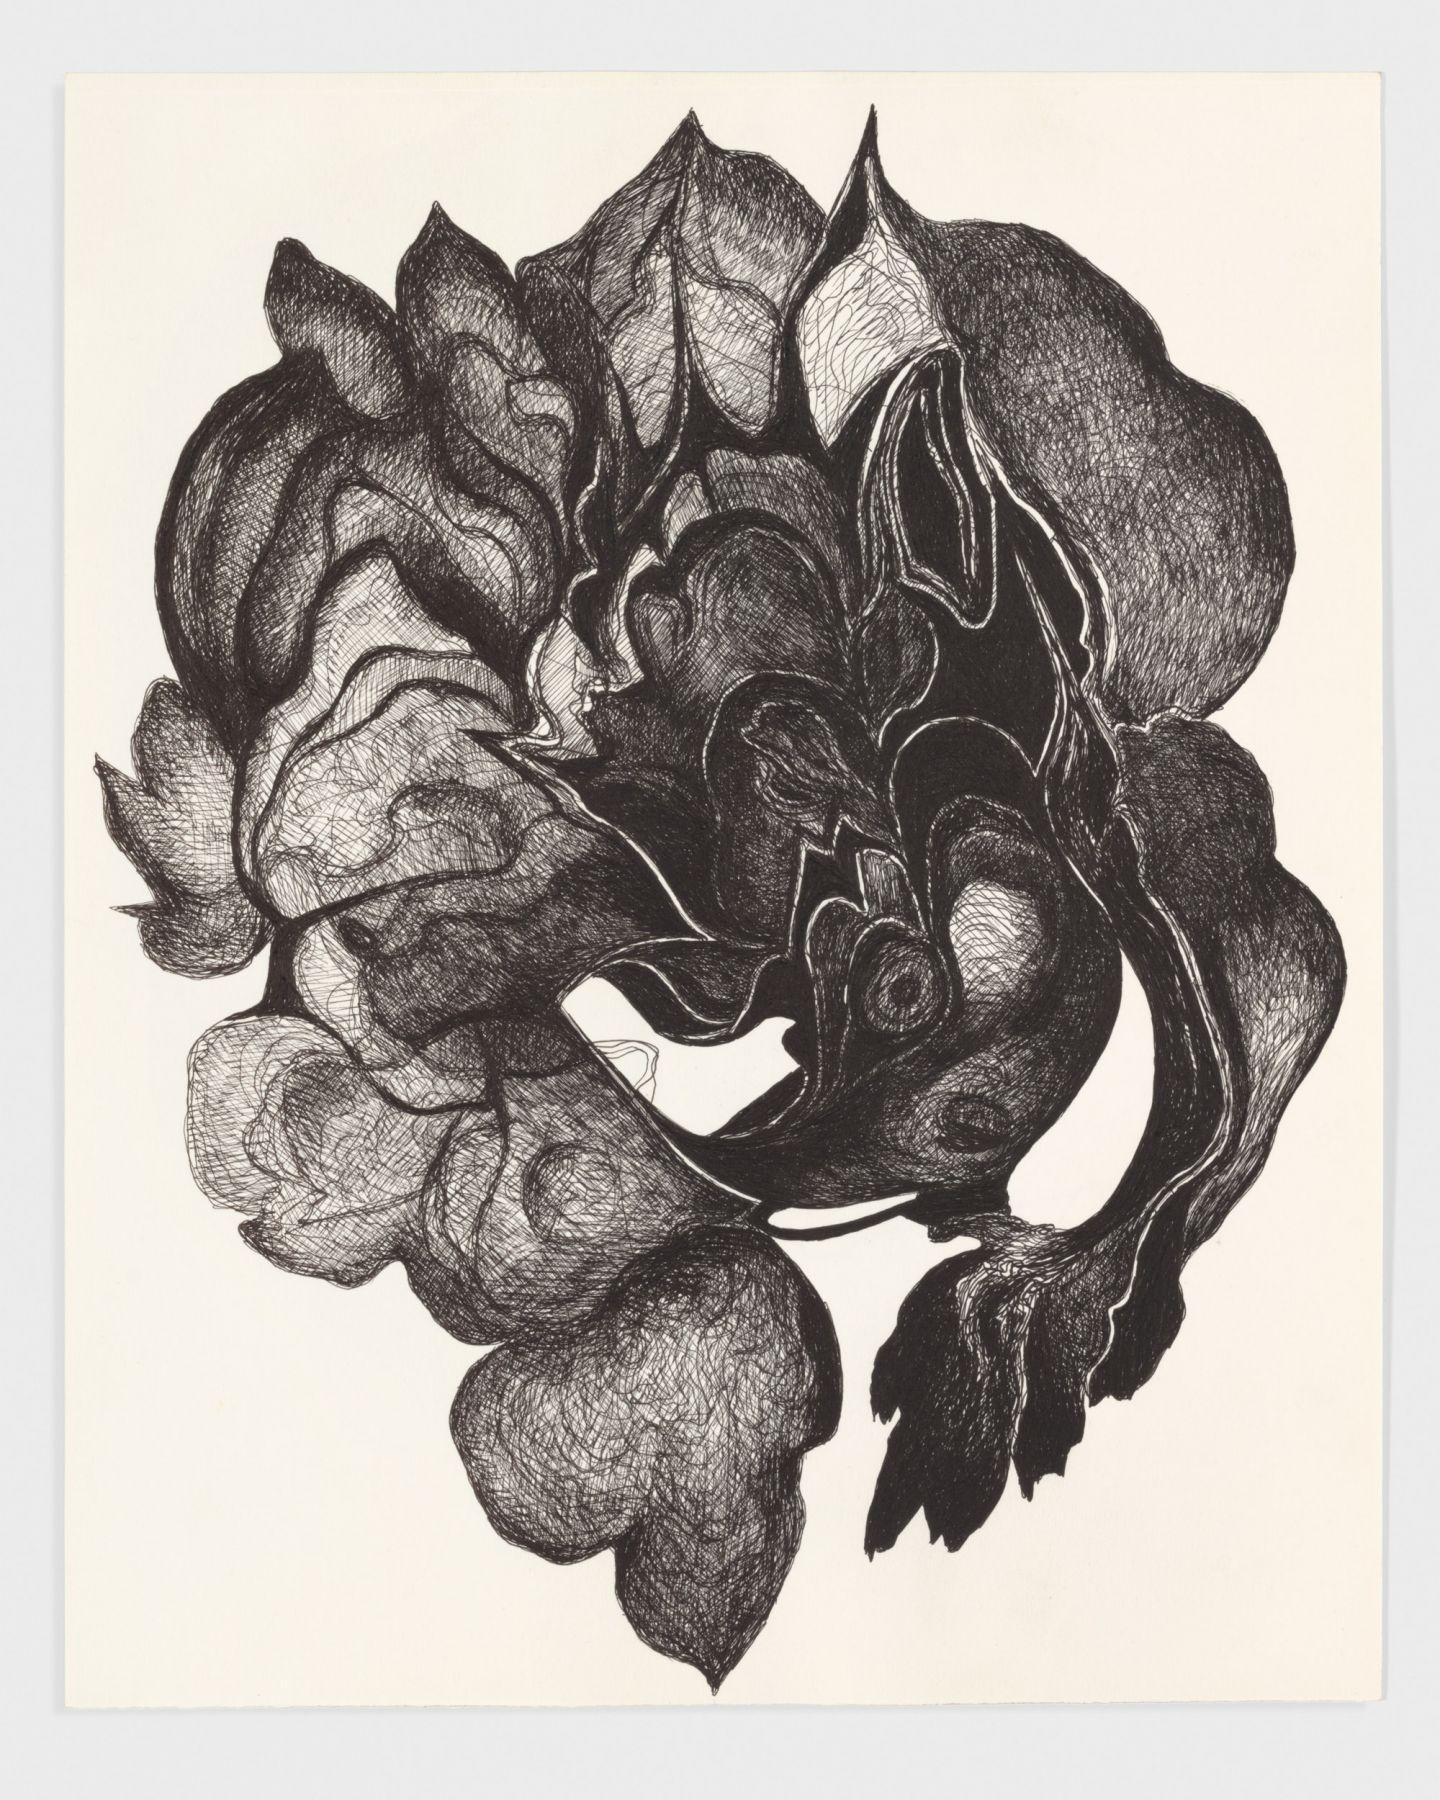 Untitled, c. 1965-68